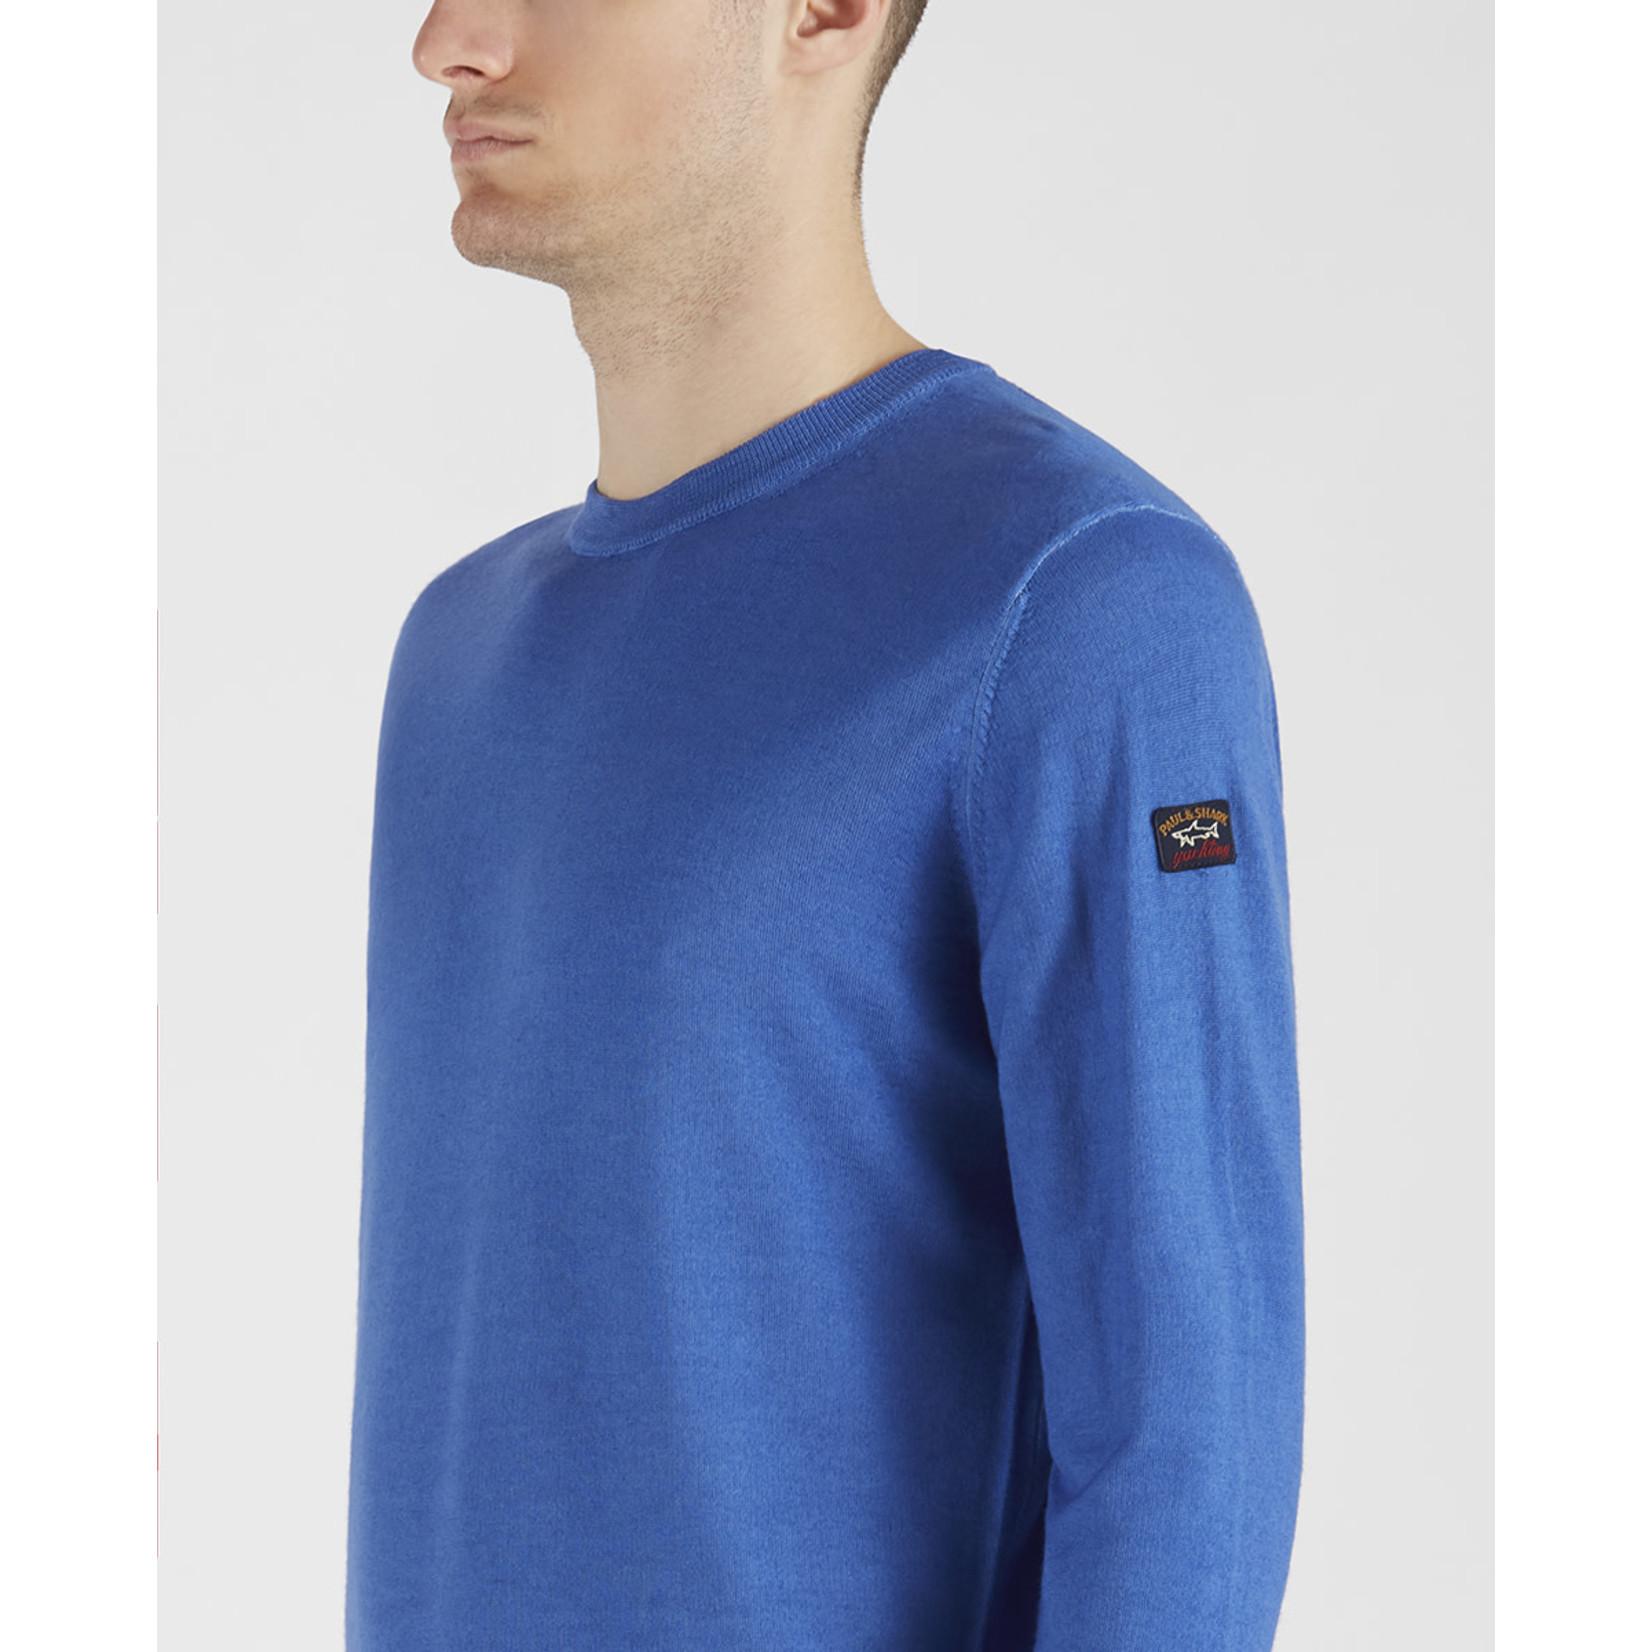 Paul & Shark pullover ronde hals blauw